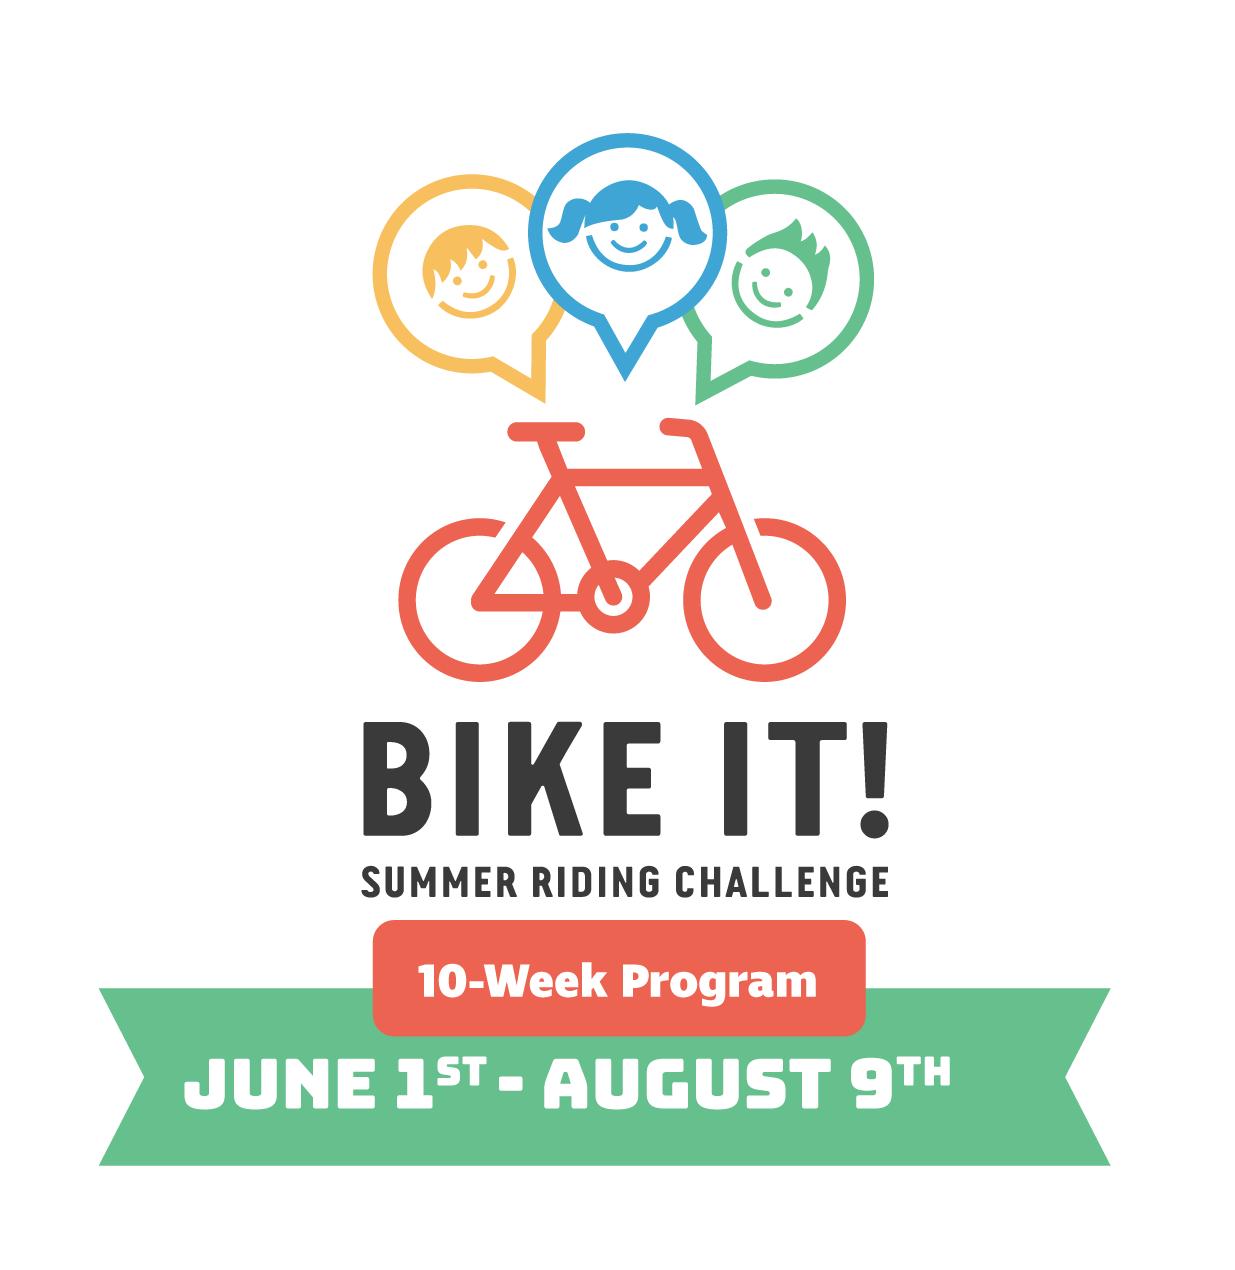 Bike It! summer riding challenge. 10 week program, June 1st - August 9th.